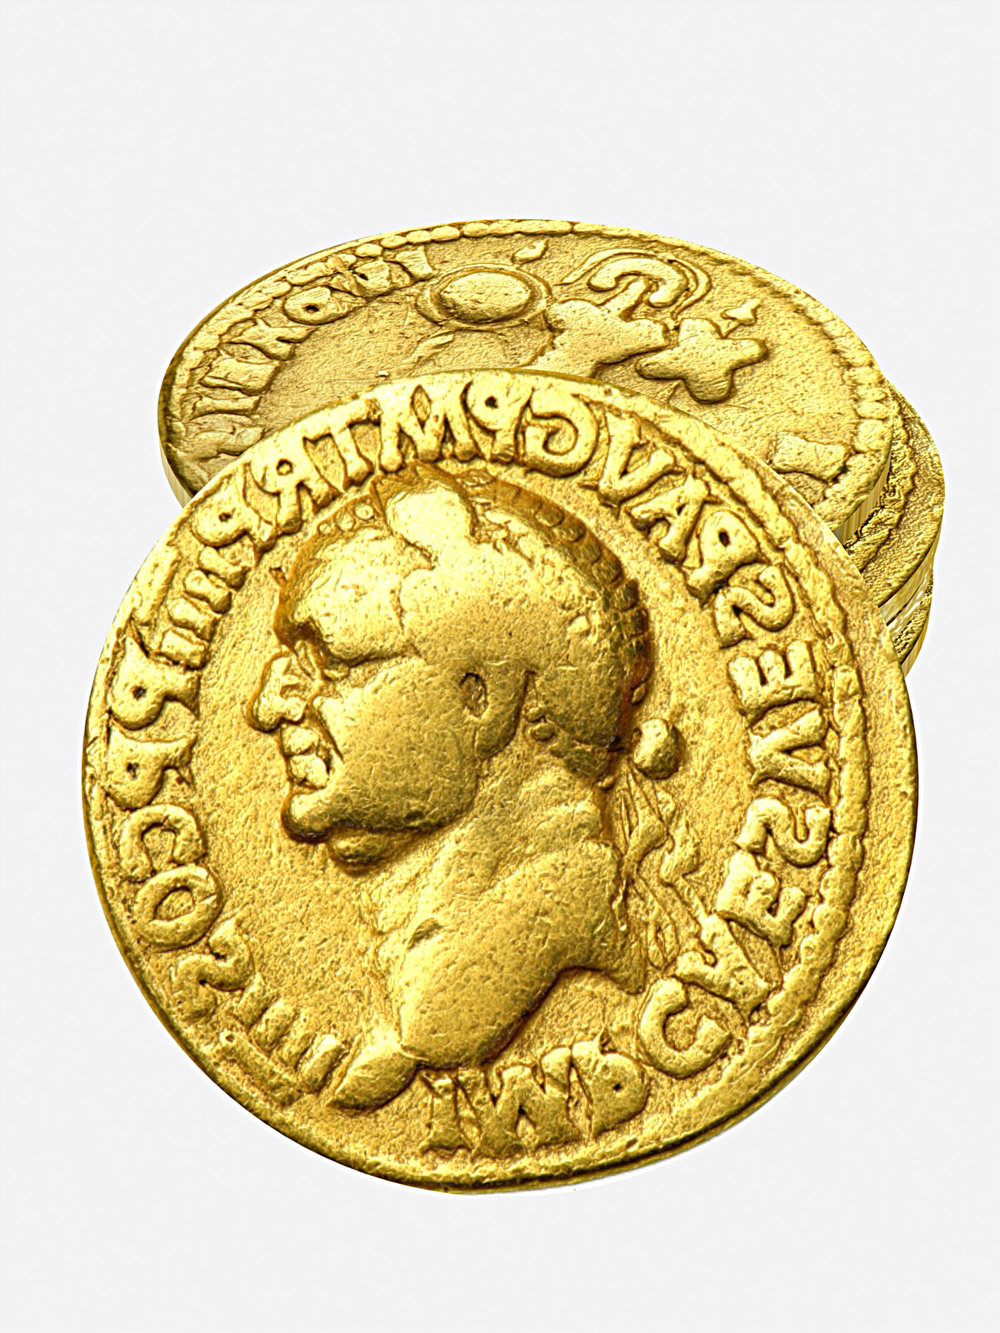 gold-coins-1236476.jpg